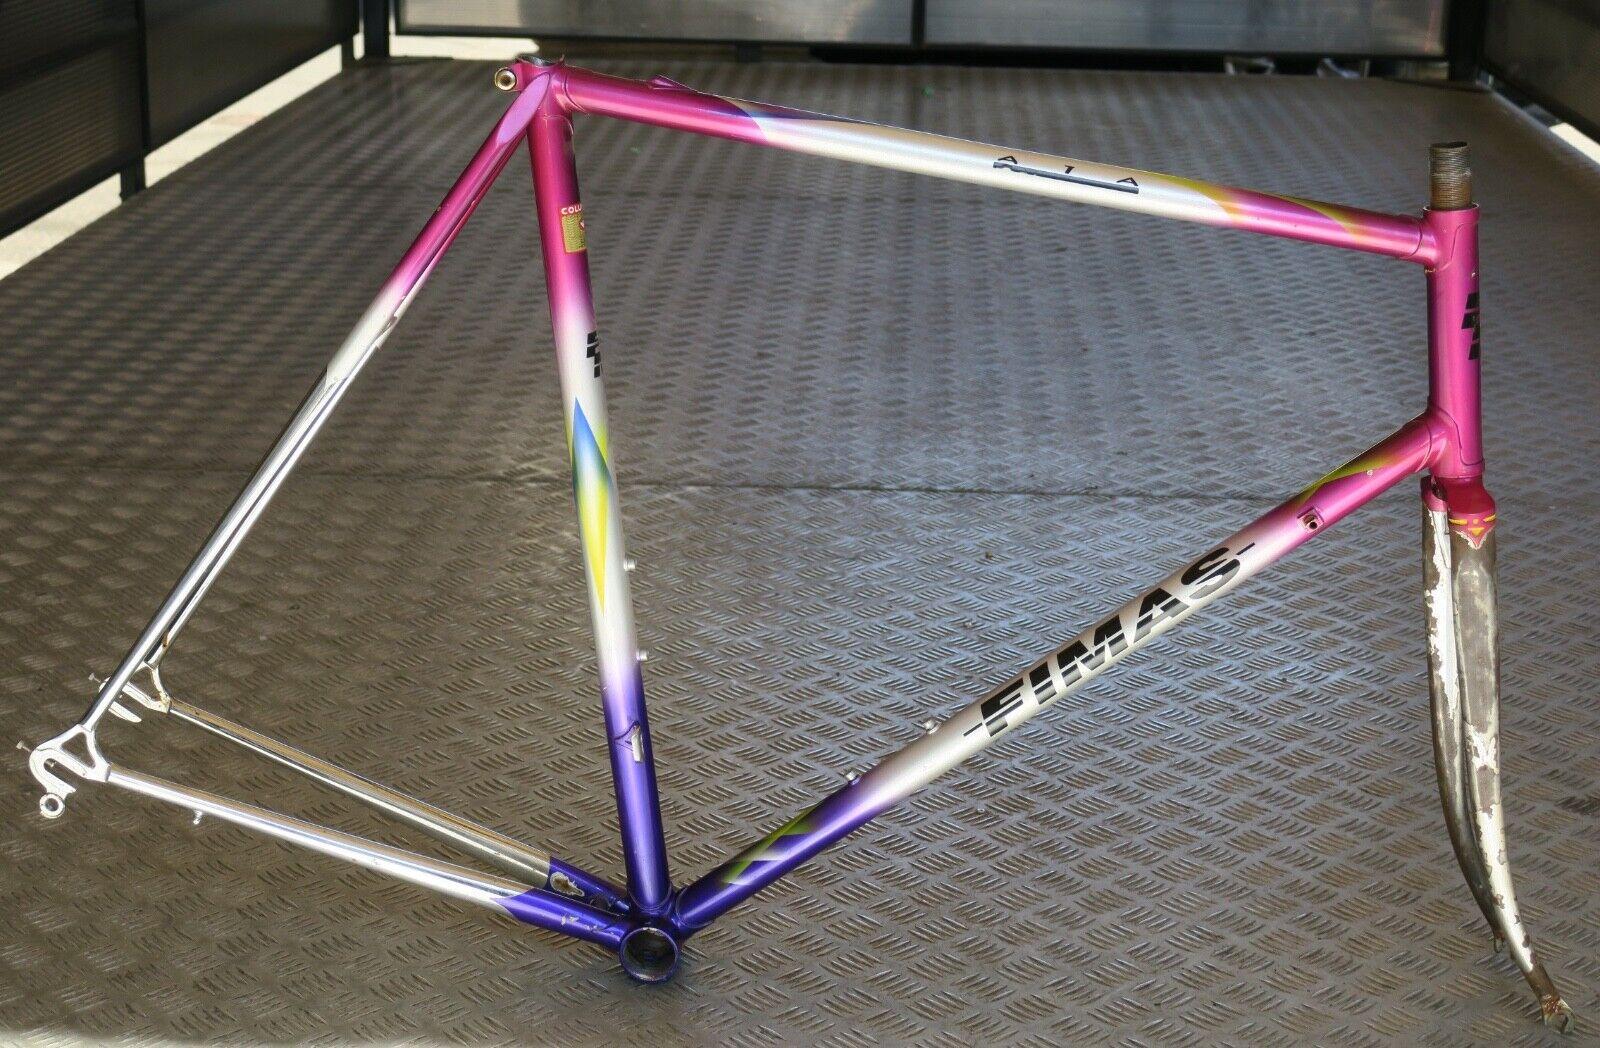 Fimas road bike steel frameset, Columbus Slx New, 58 cm, Campagnolo drops